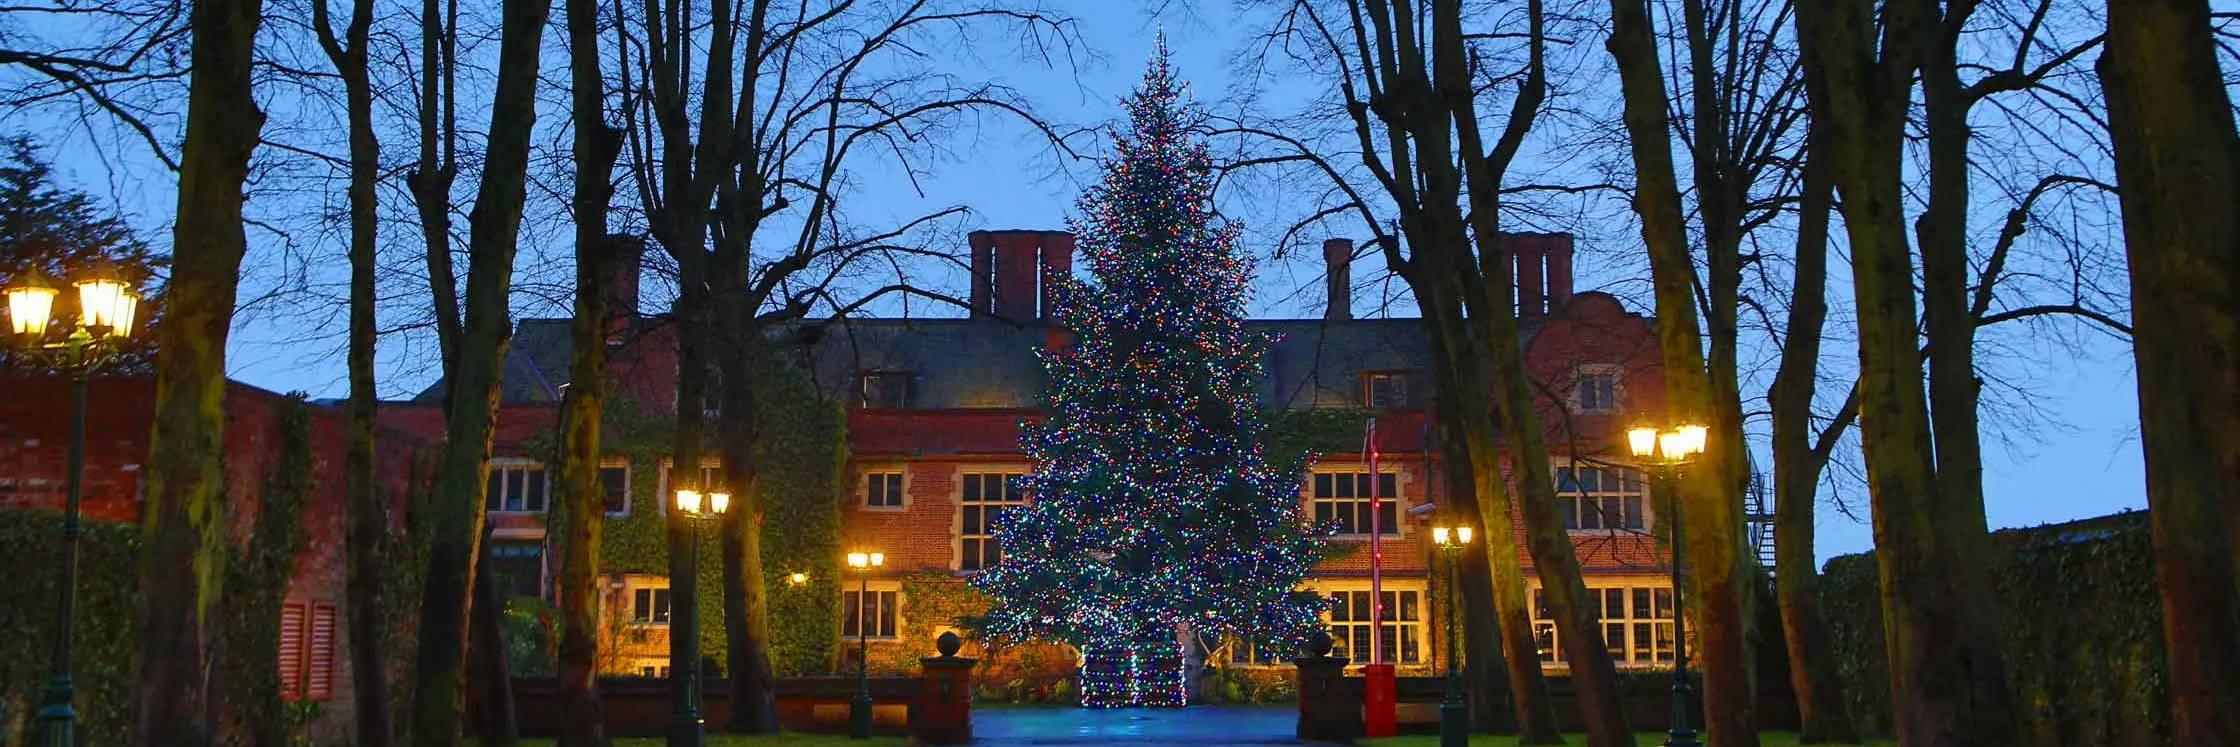 Large Christmas tree illuminated by multi coloured lights outside